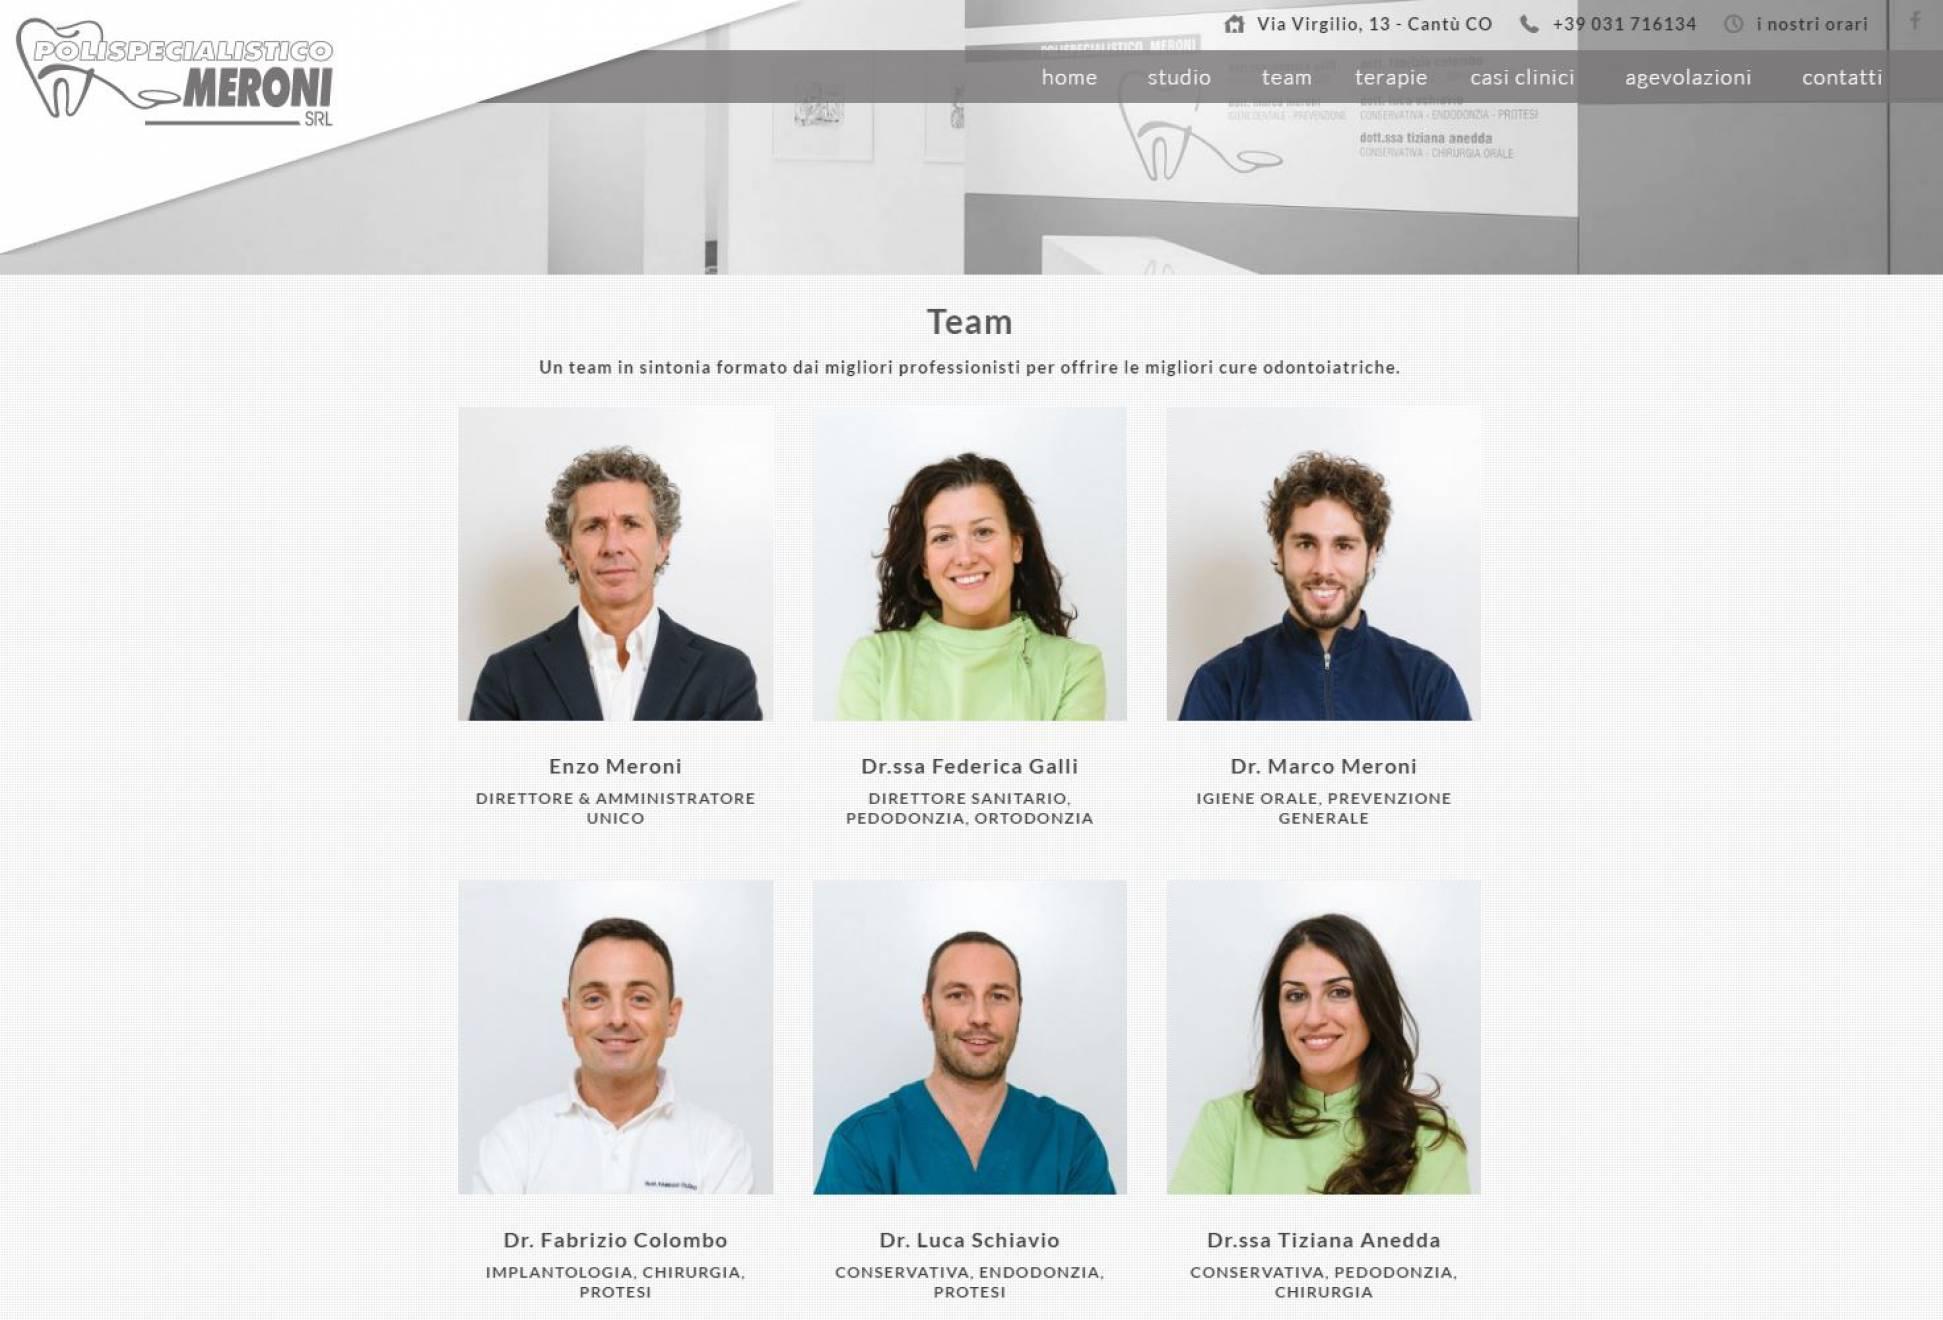 Team Polispecialistico Meroni sito internet landing page